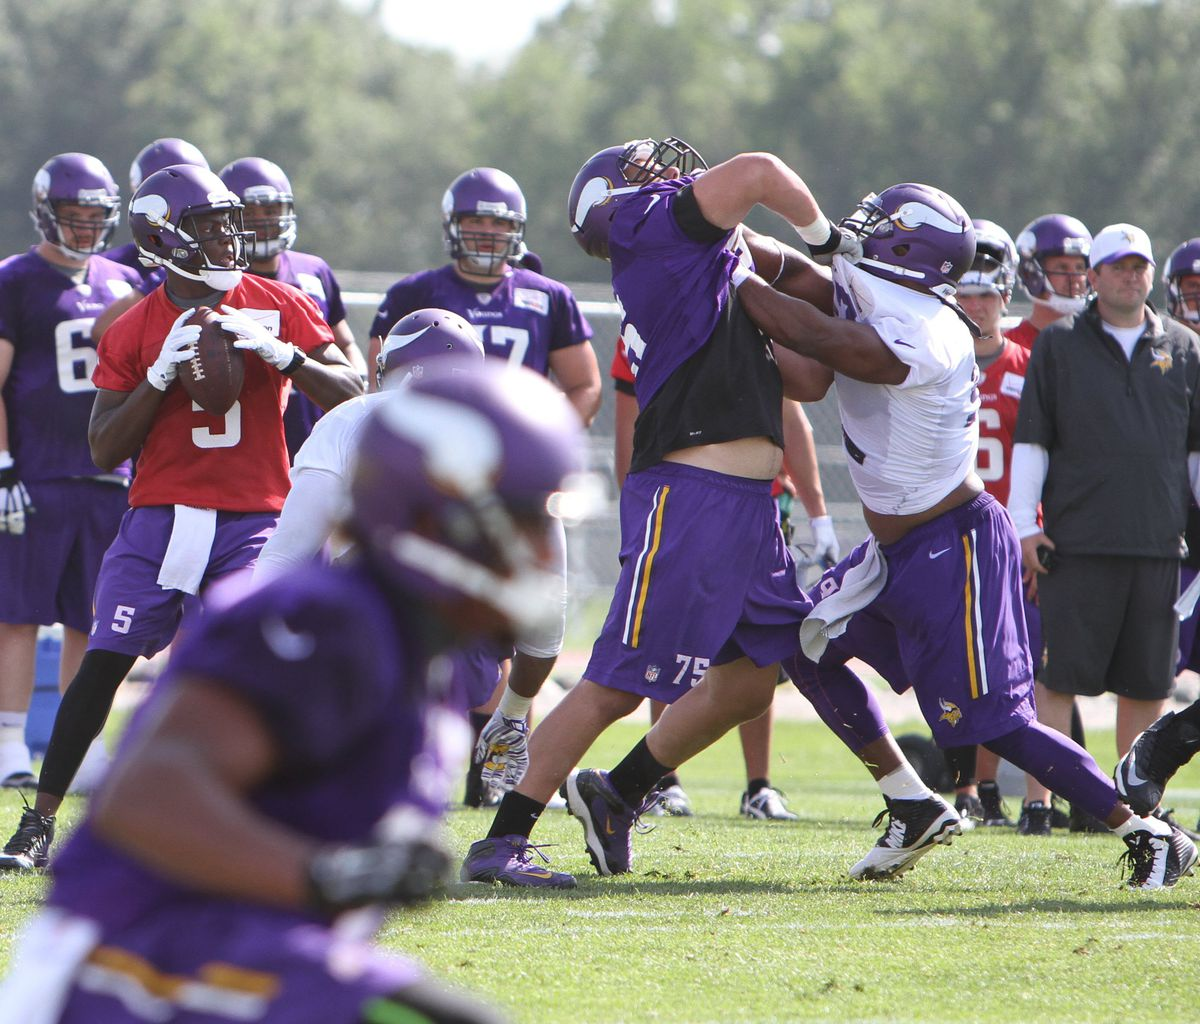 Minnesota Vikings 2015 Training Camp Photo Gallery: July 27, 2015